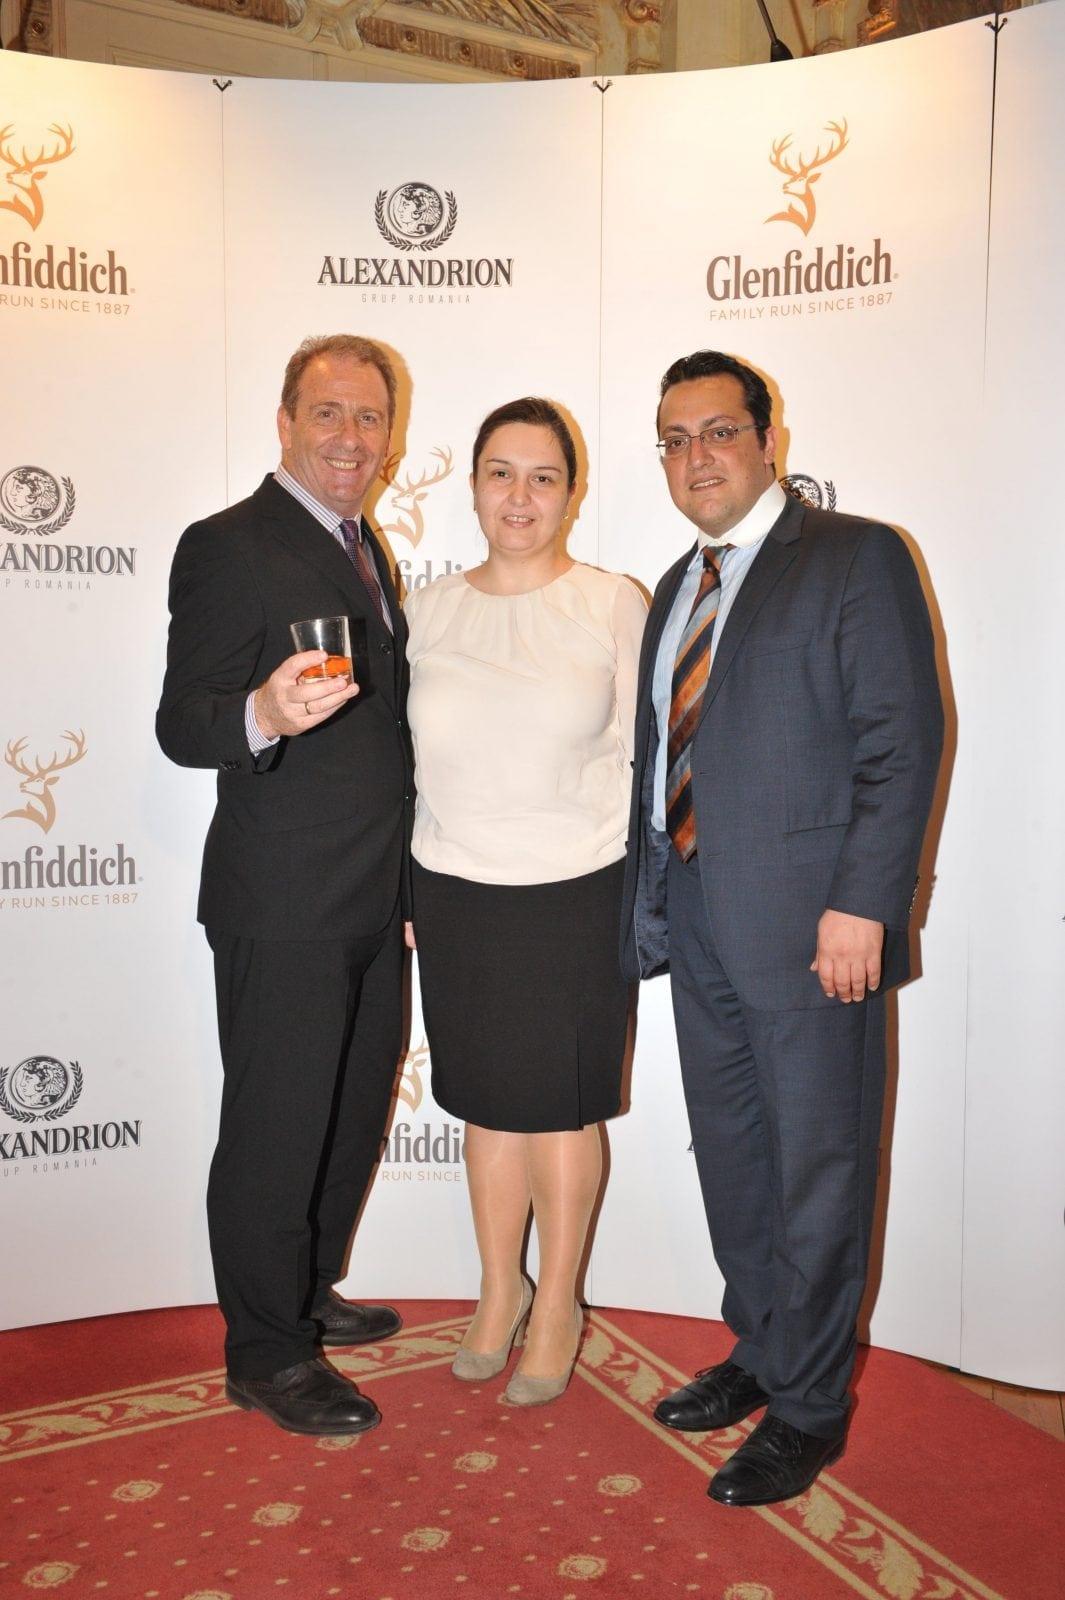 Glenfiddich Photowall Ian Millar Oana Gresoiu si Nikos Zygouropoulos - Ambasadorul Glenfiddich, Ian Millar, în vizită la București